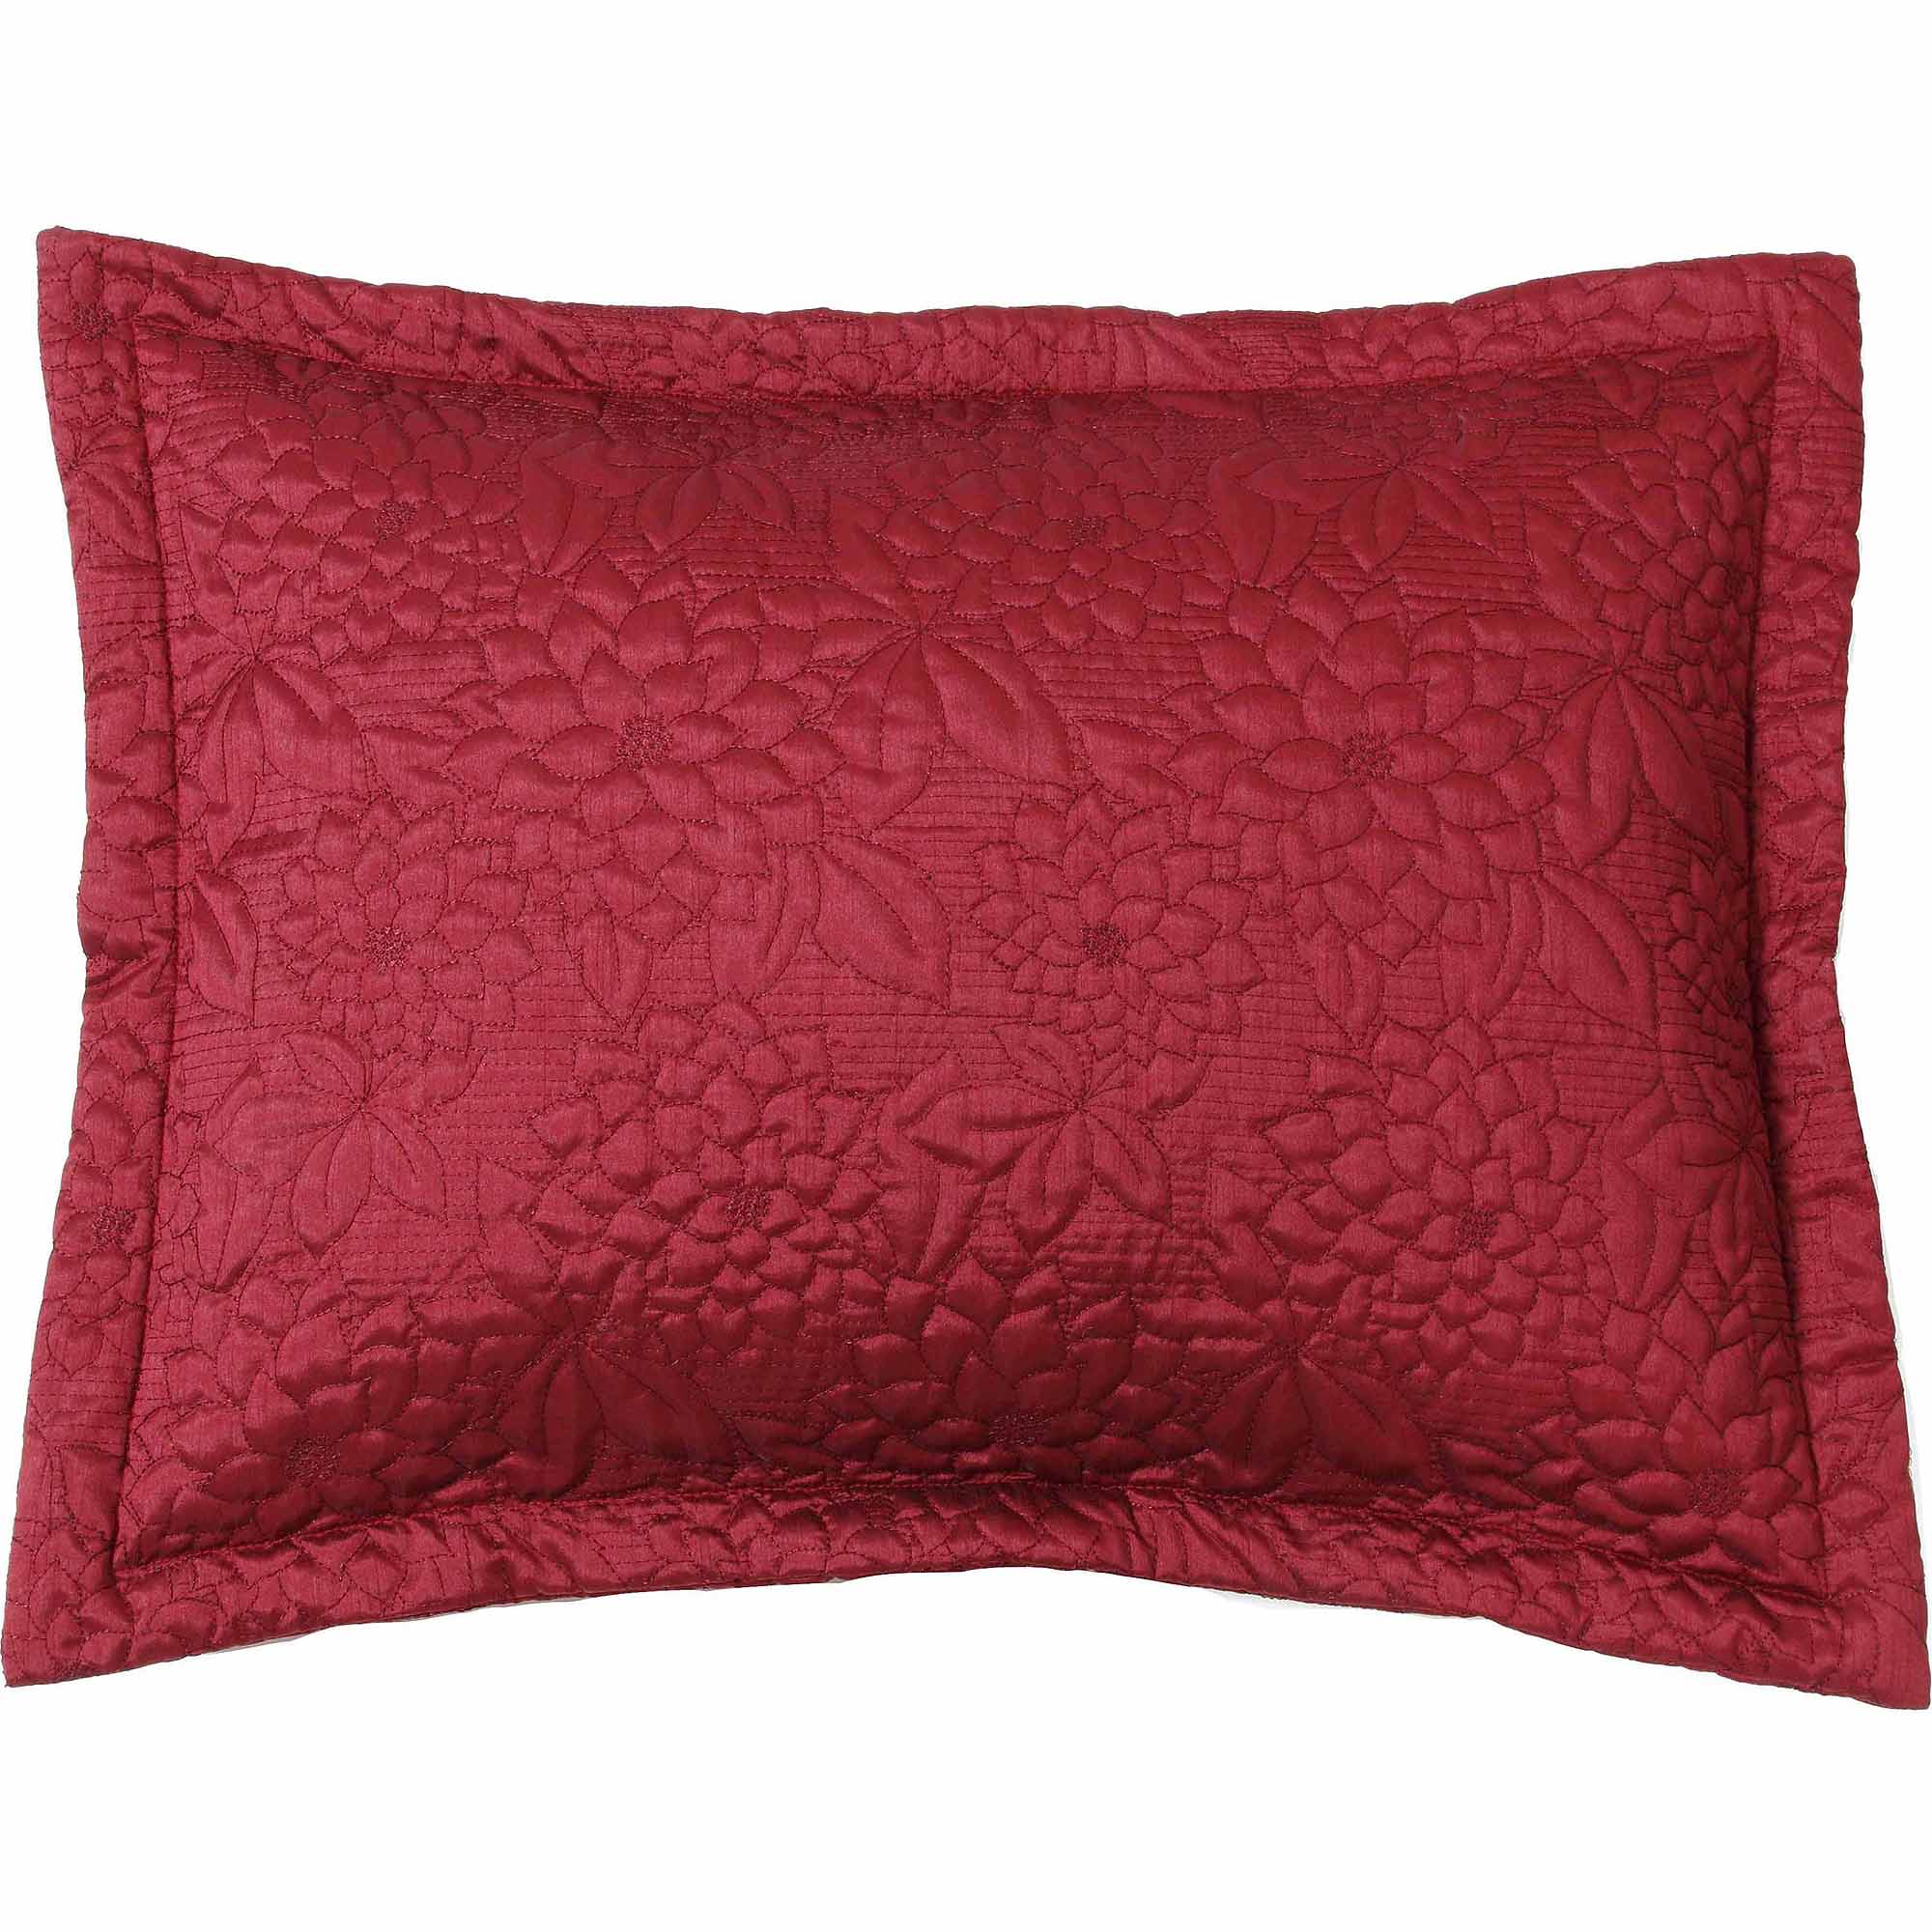 Belle Maison Gardenia Embroidered Quilted Standard Sham, Red